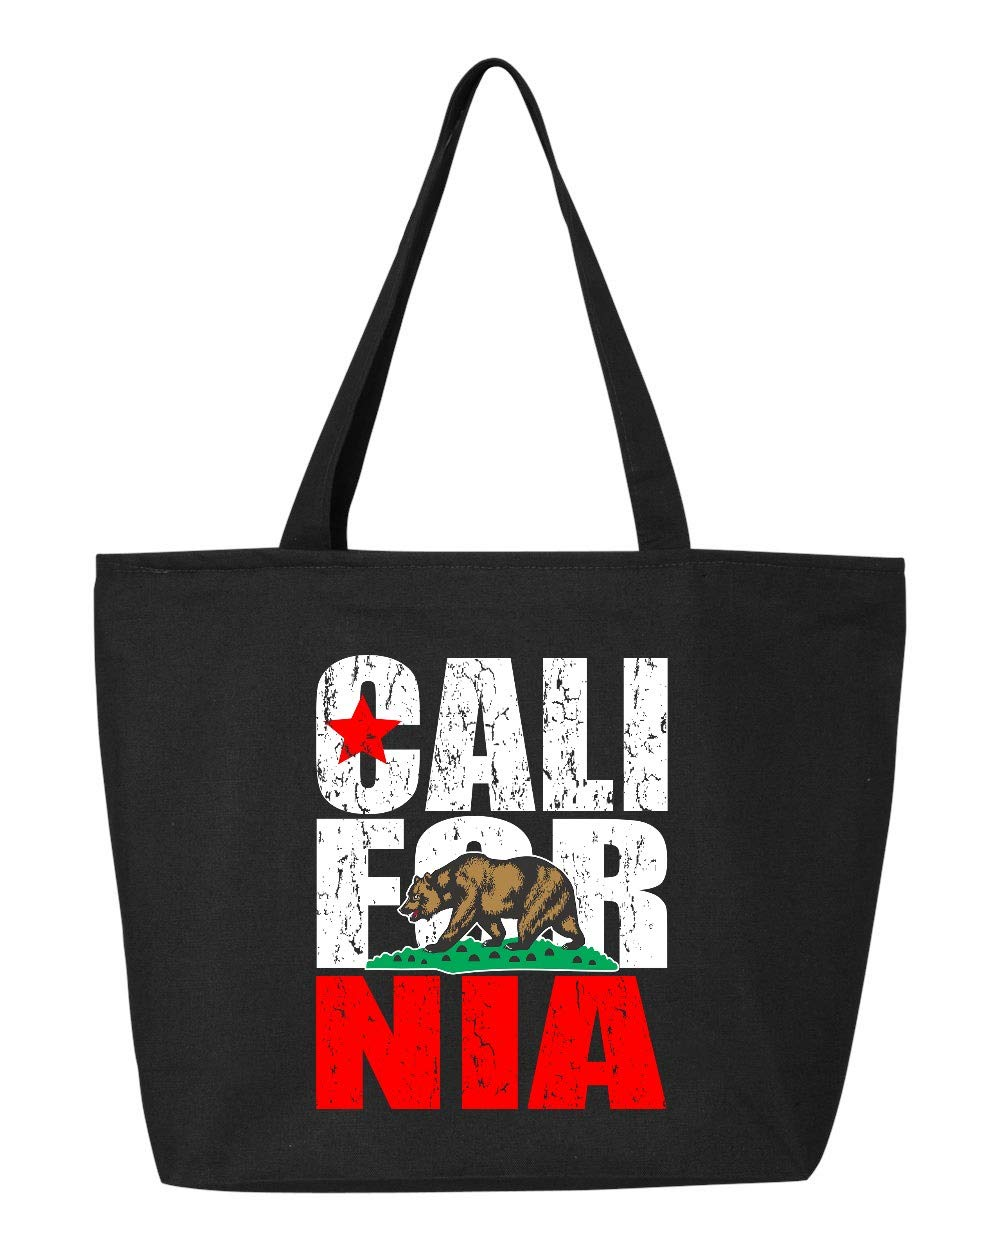 (1, Black) - Shop4Ever California Republic Vintage Heavy Canvas Tote with Zipper State Flag Reusable Shopping Bag 350ml Black 1 Pack Zip B06XP33RNL ブラック 1